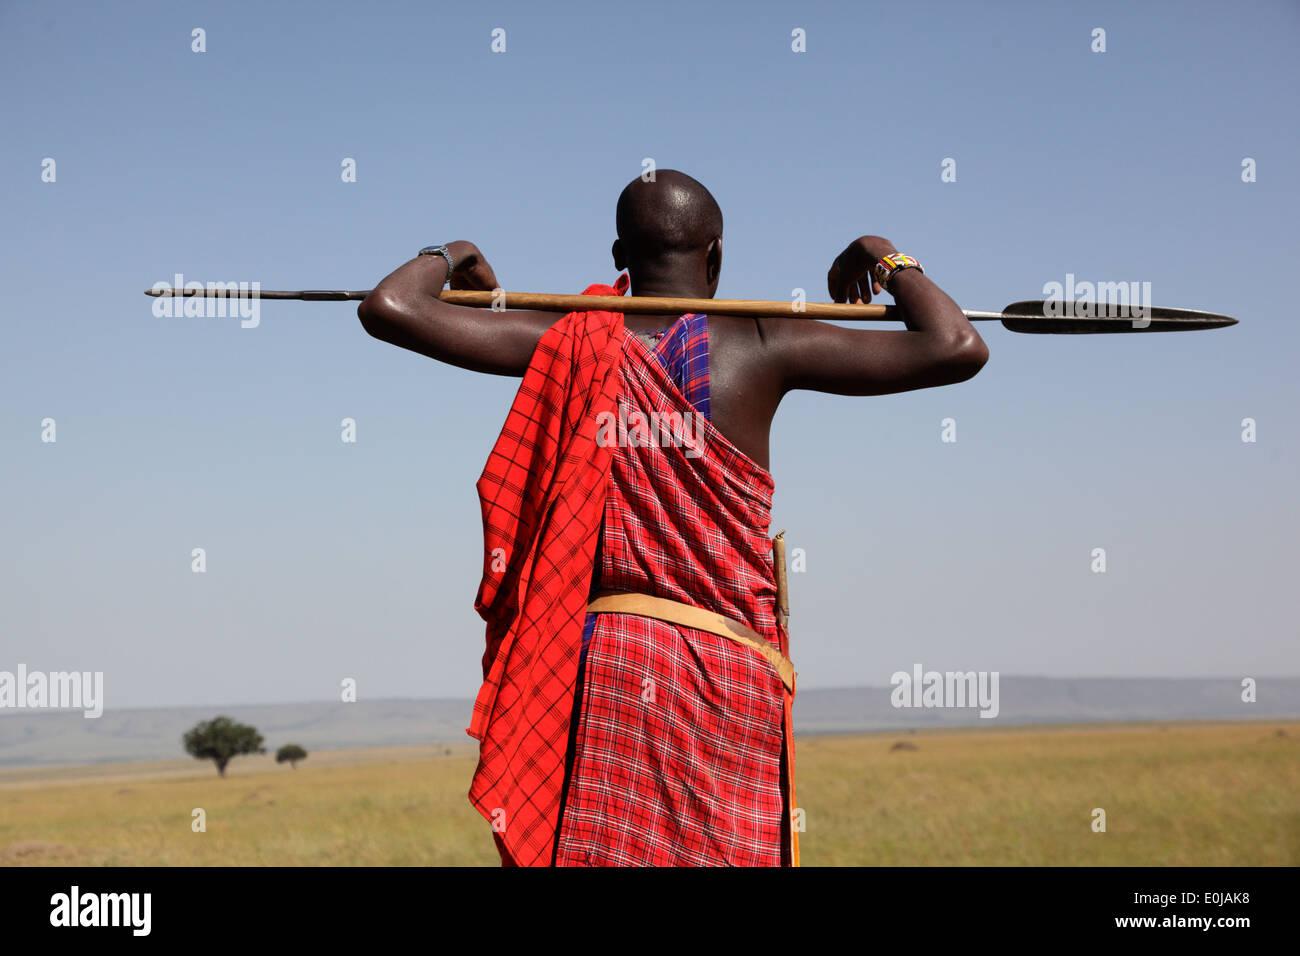 Masai Spear Stock Photos & Masai Spear Stock Images - Alamy